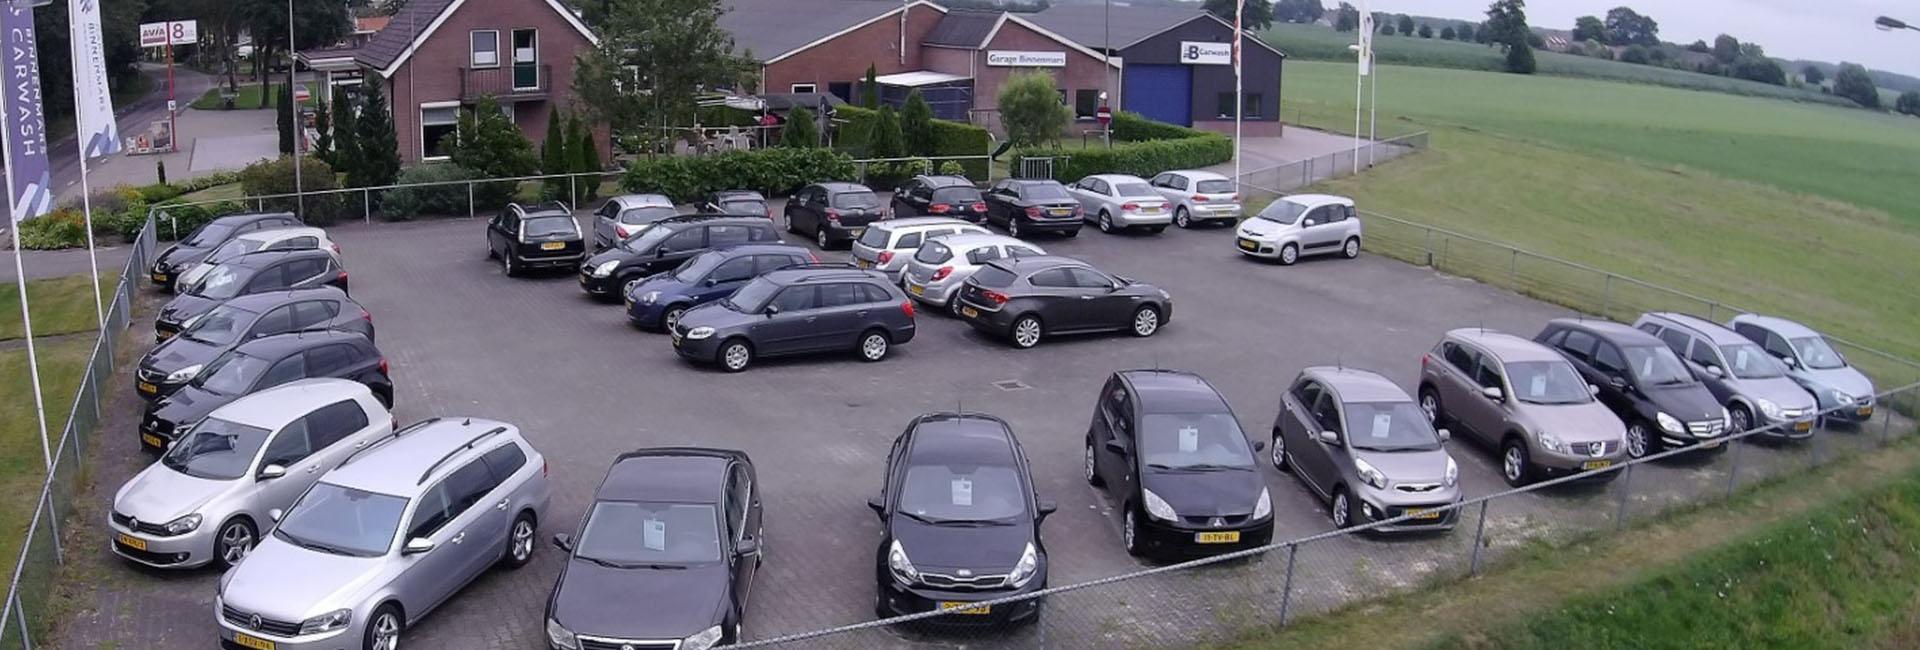 Garage_Binnenmars_visual_2